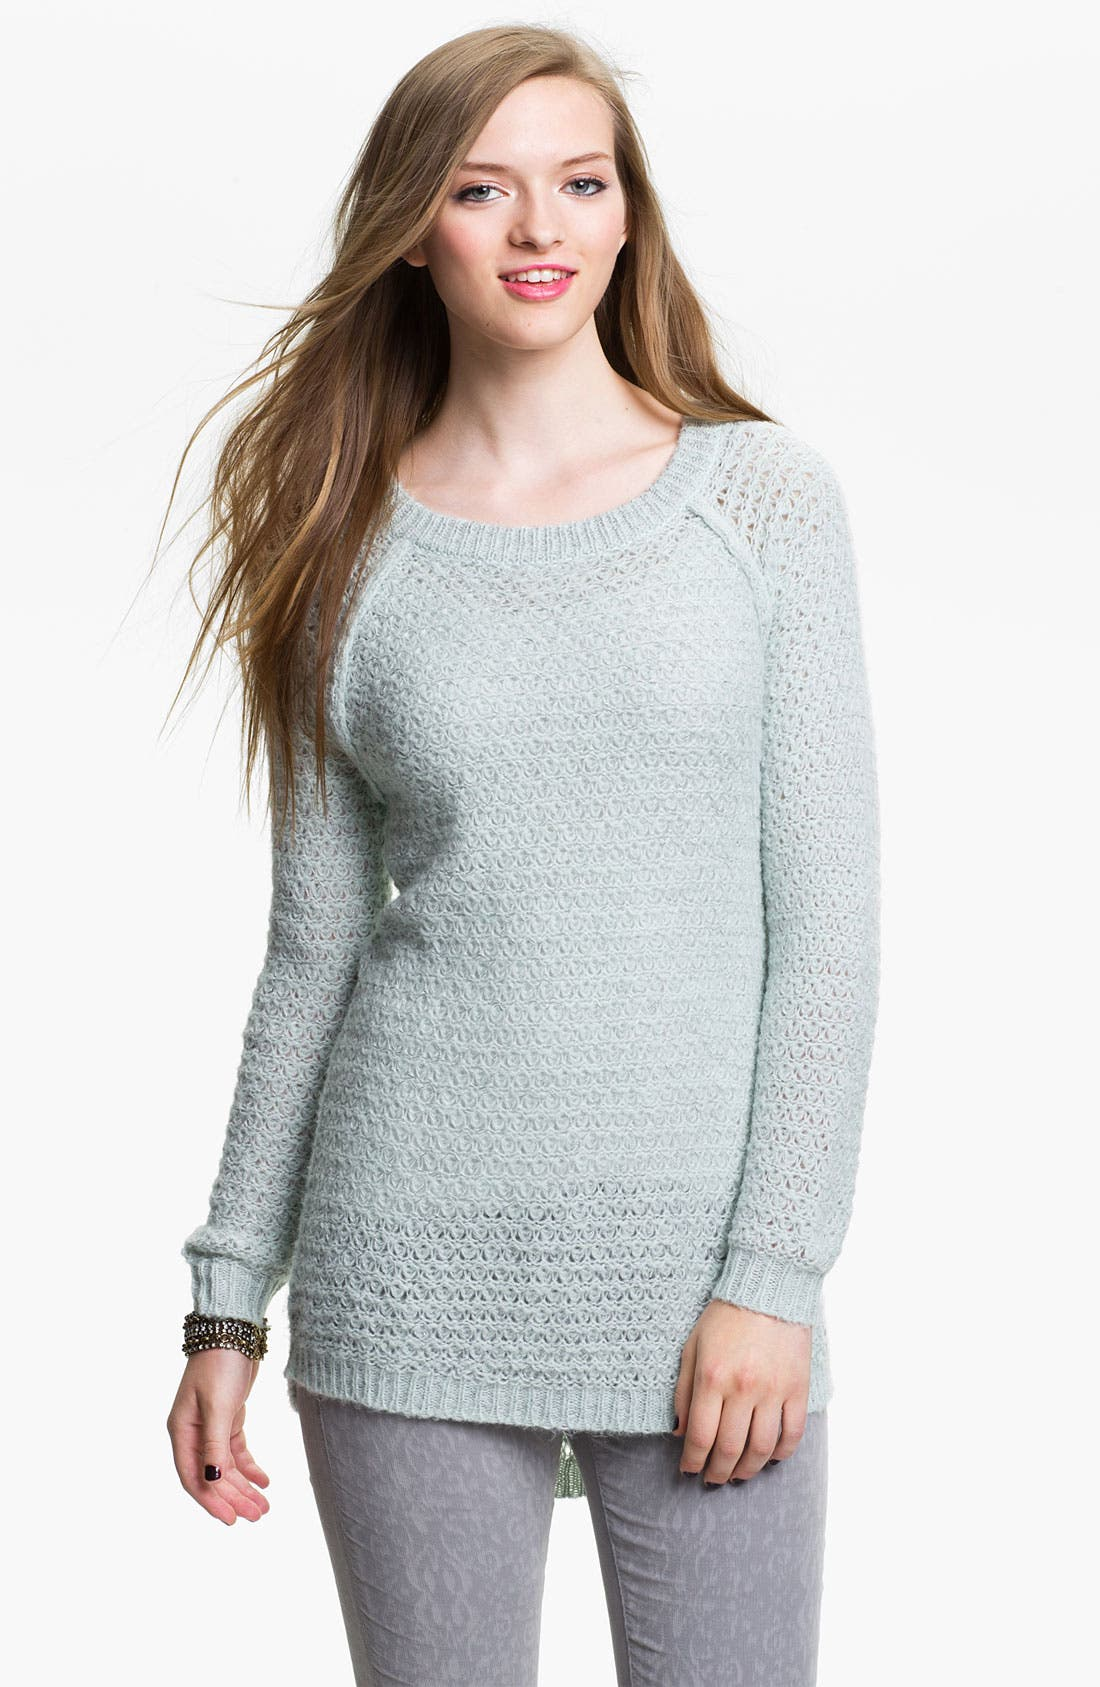 Alternate Image 1 Selected - Frenchi® Airy Oversized Sweater (Juniors)